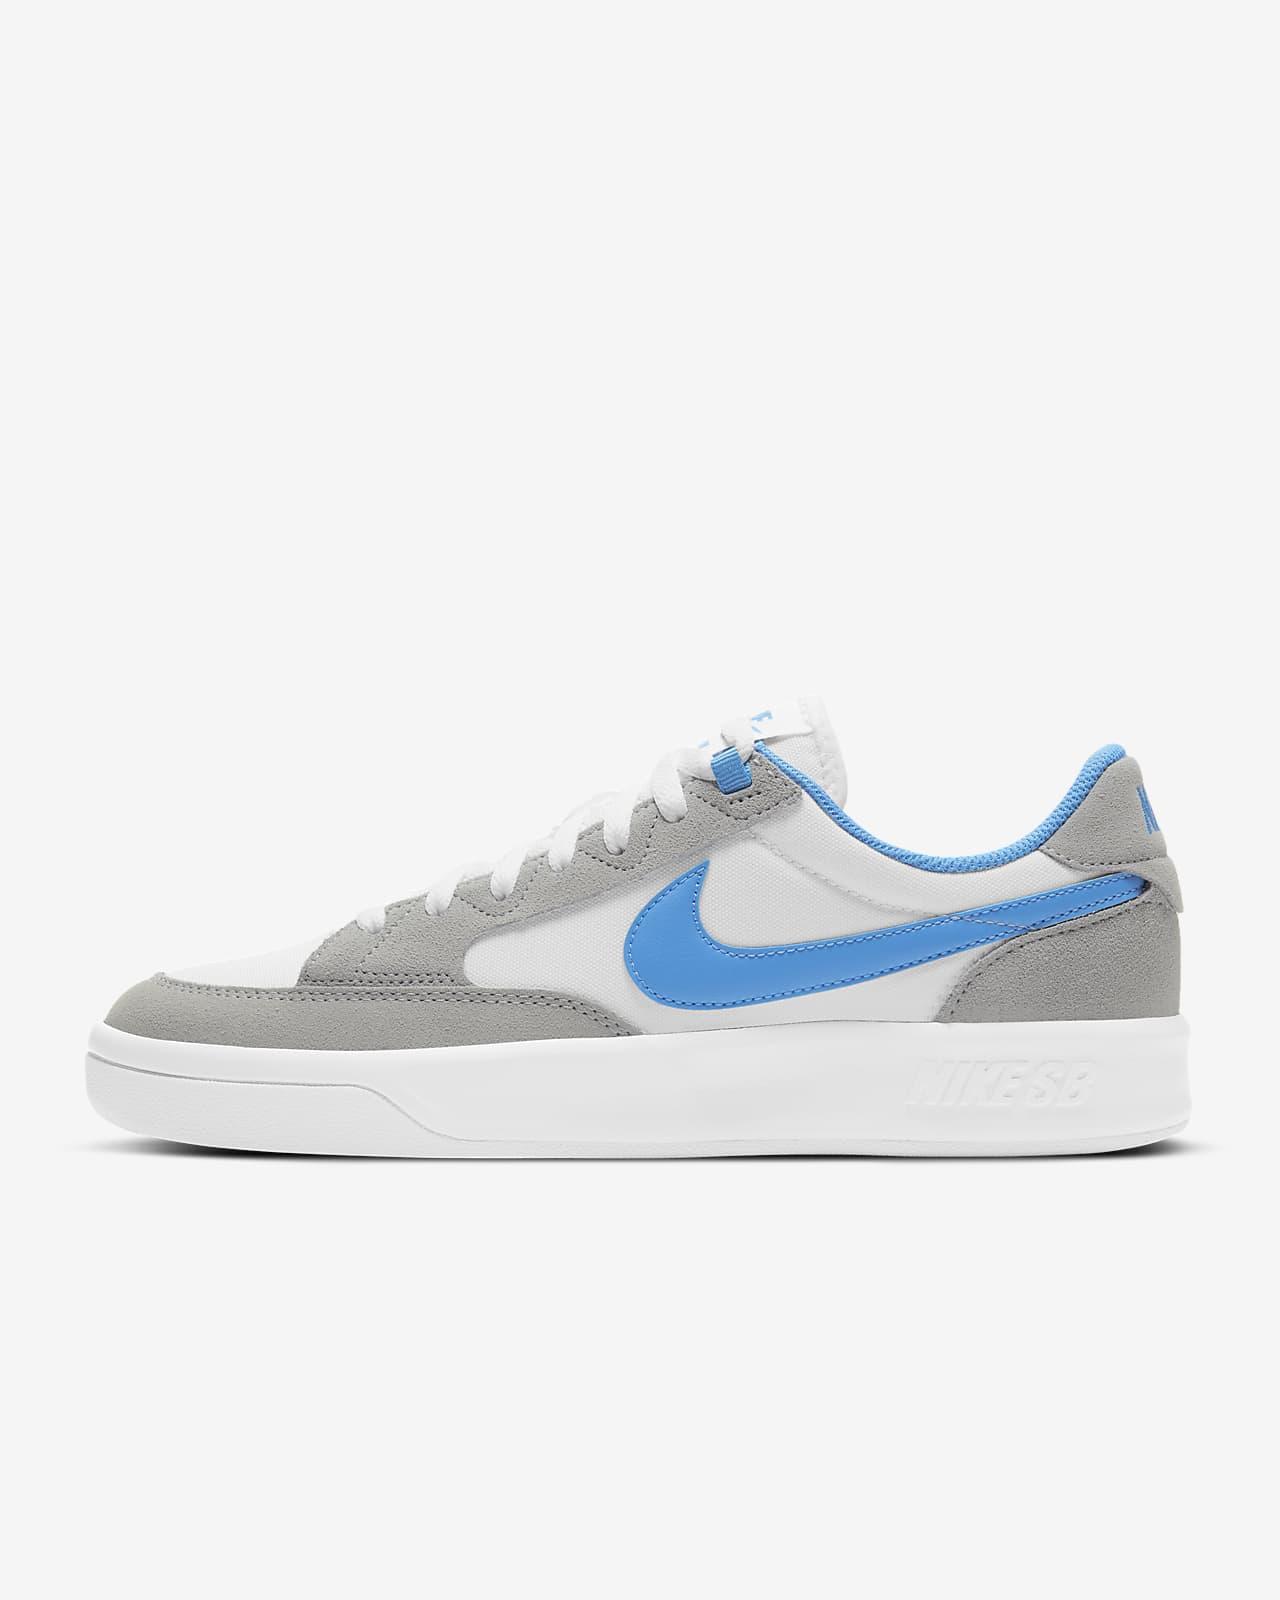 Buty do skateboardingu Nike SB Adversary Premium